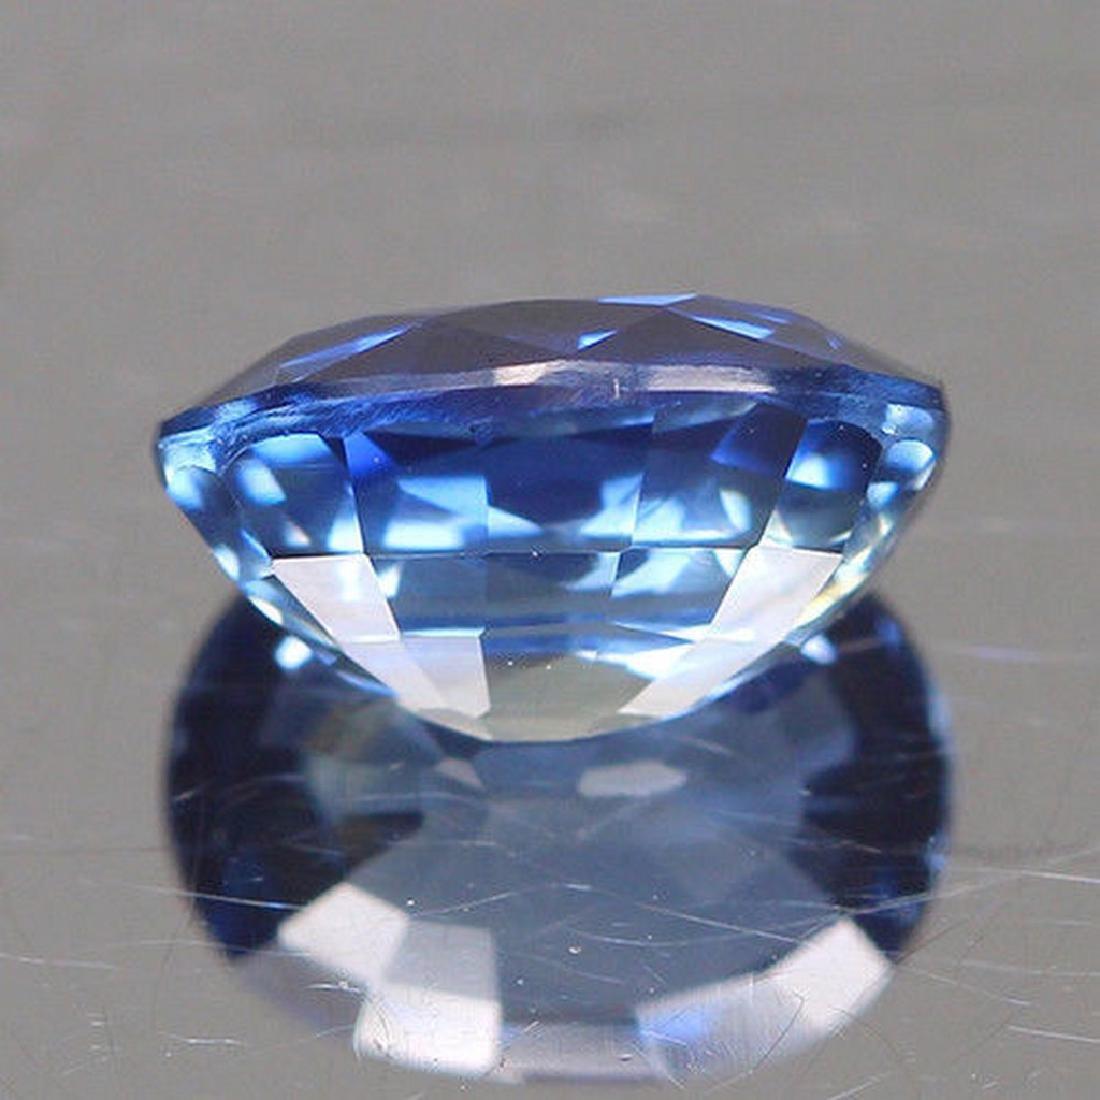 1.09 ct Sri Lanka Sapphire - 2